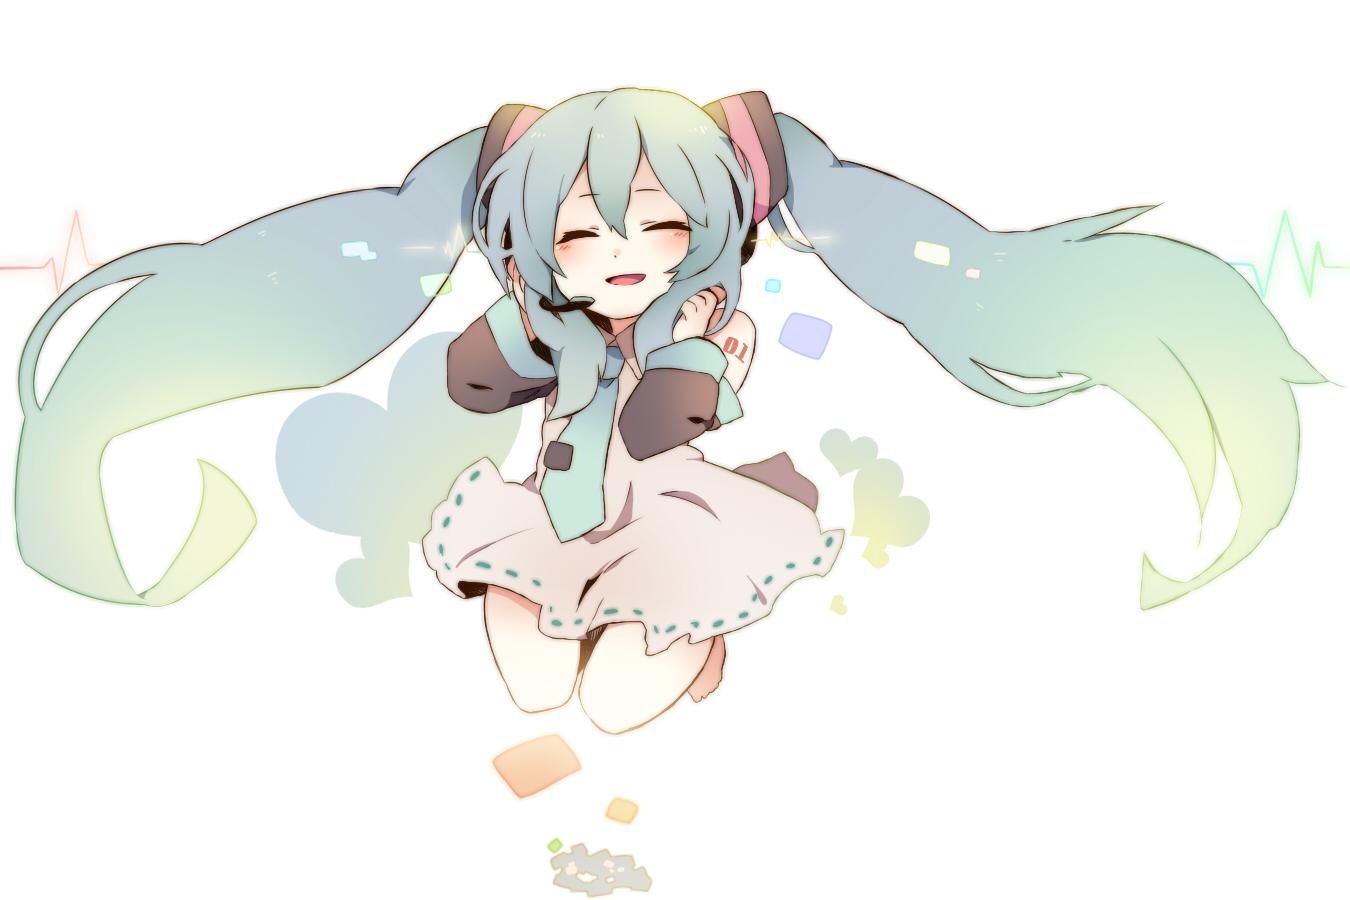 blue_hair dress hatsune_miku kokoroa loli long_hair tie twintails vocaloid white